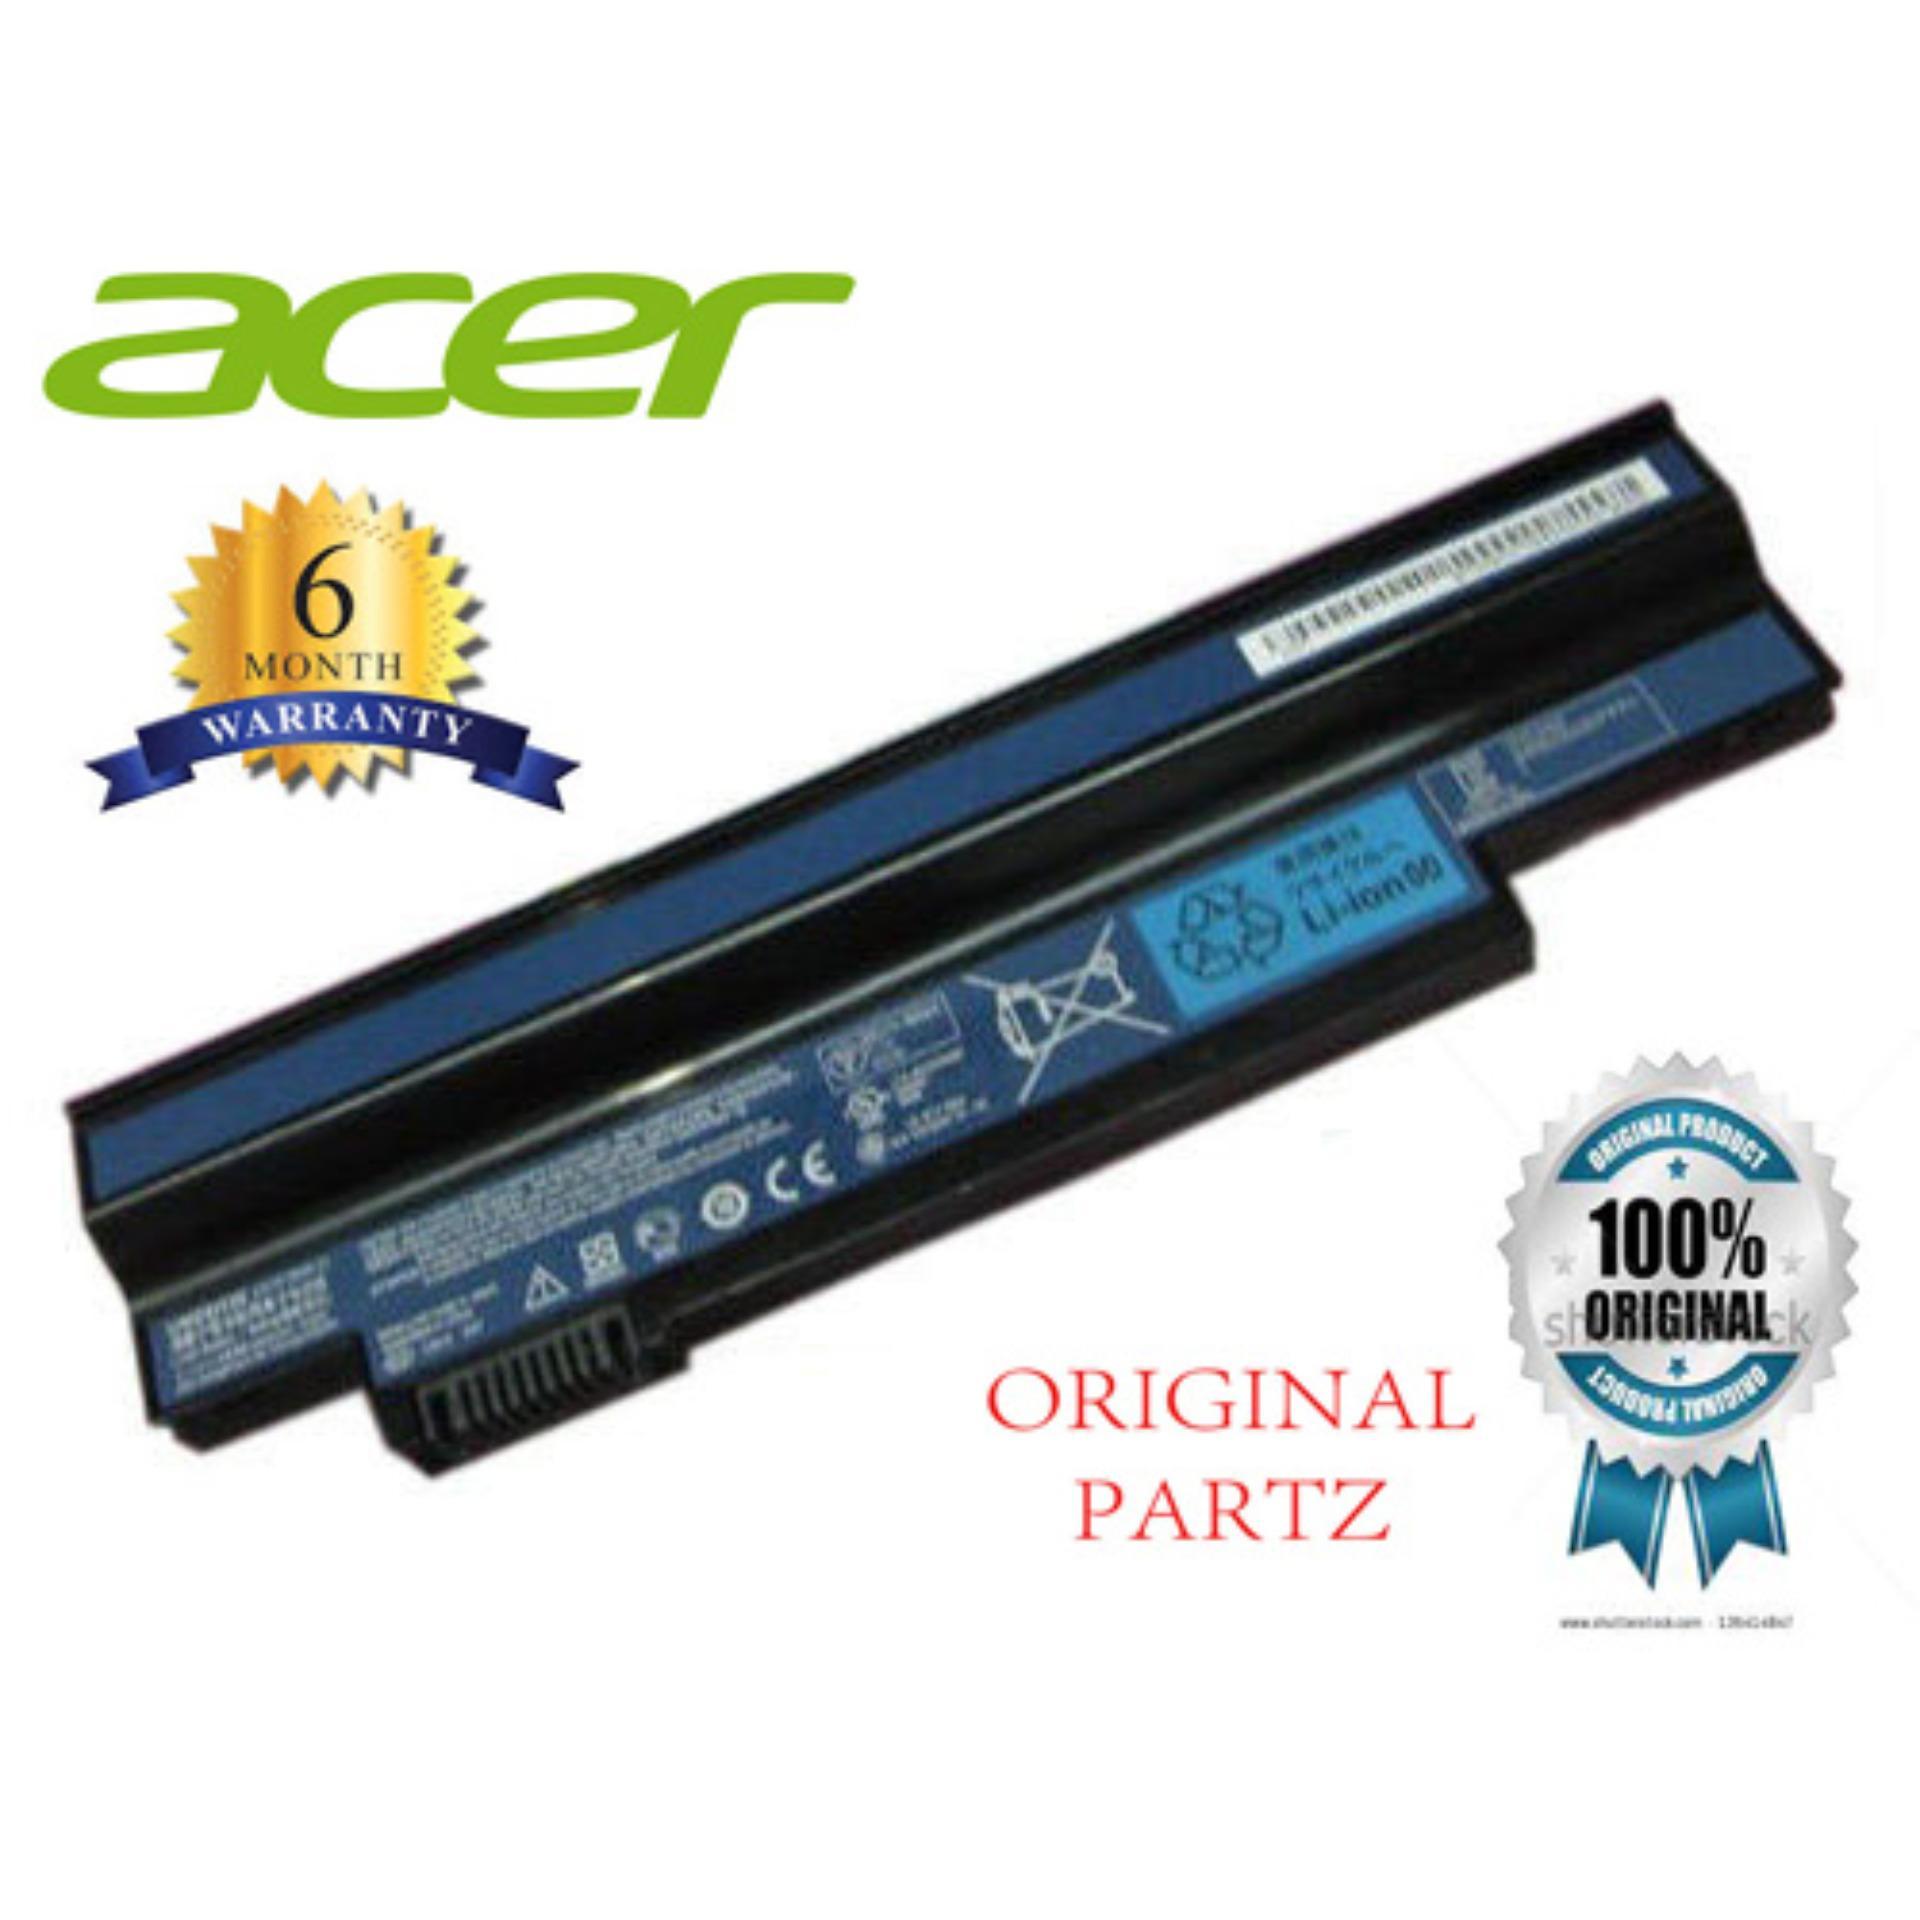 Kelebihan Acer Aspire Switch One Sw1 011 10c4 Terkini Daftar Harga 2in1 Laptop Original Baterai Notebook 532h Hitam Black